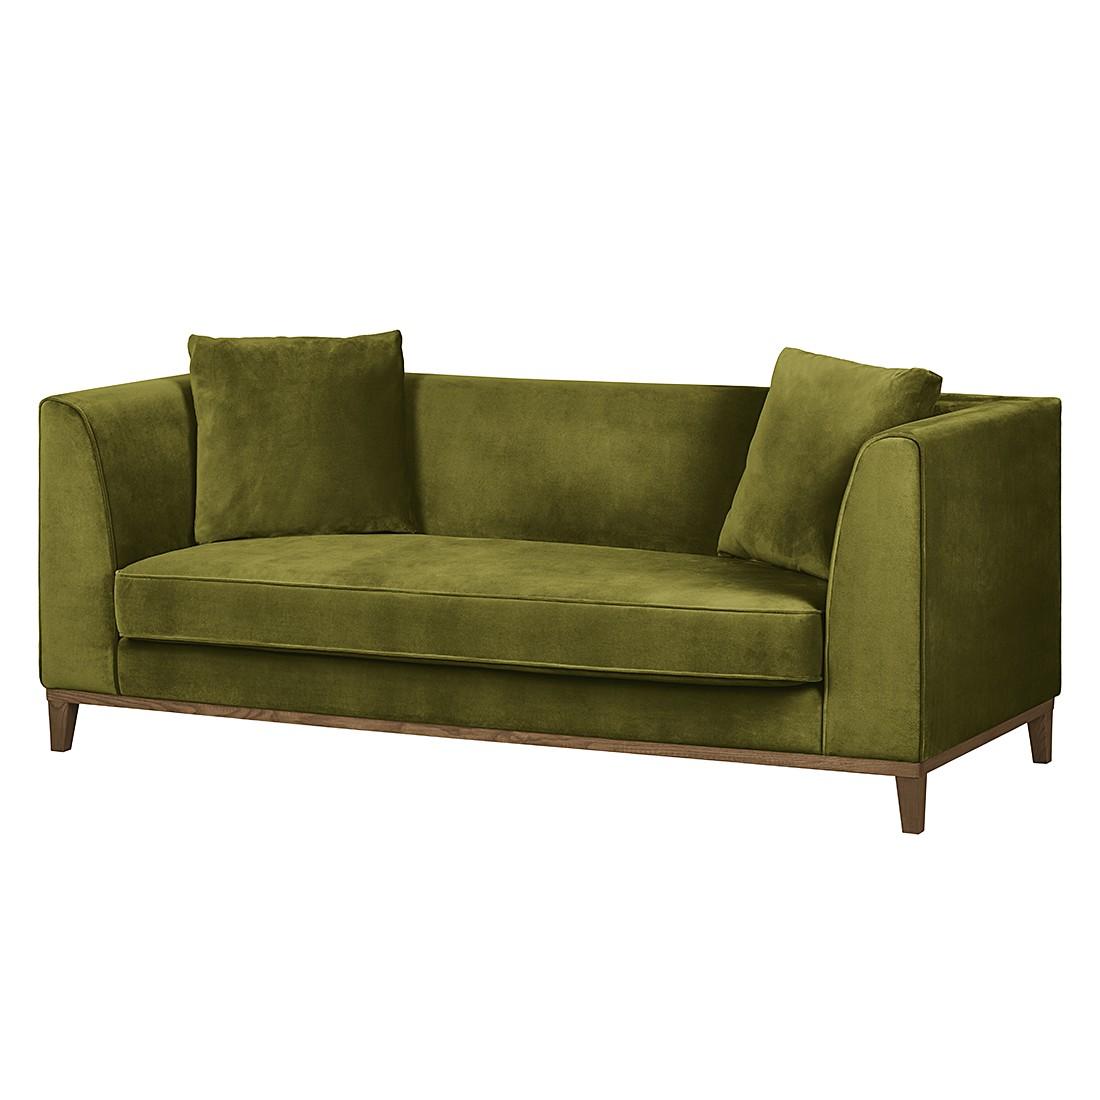 Sofa Blomma (3-Sitzer) – Samtstoff Olivgrün – Gestell: Eichefarbig, Mørteens kaufen